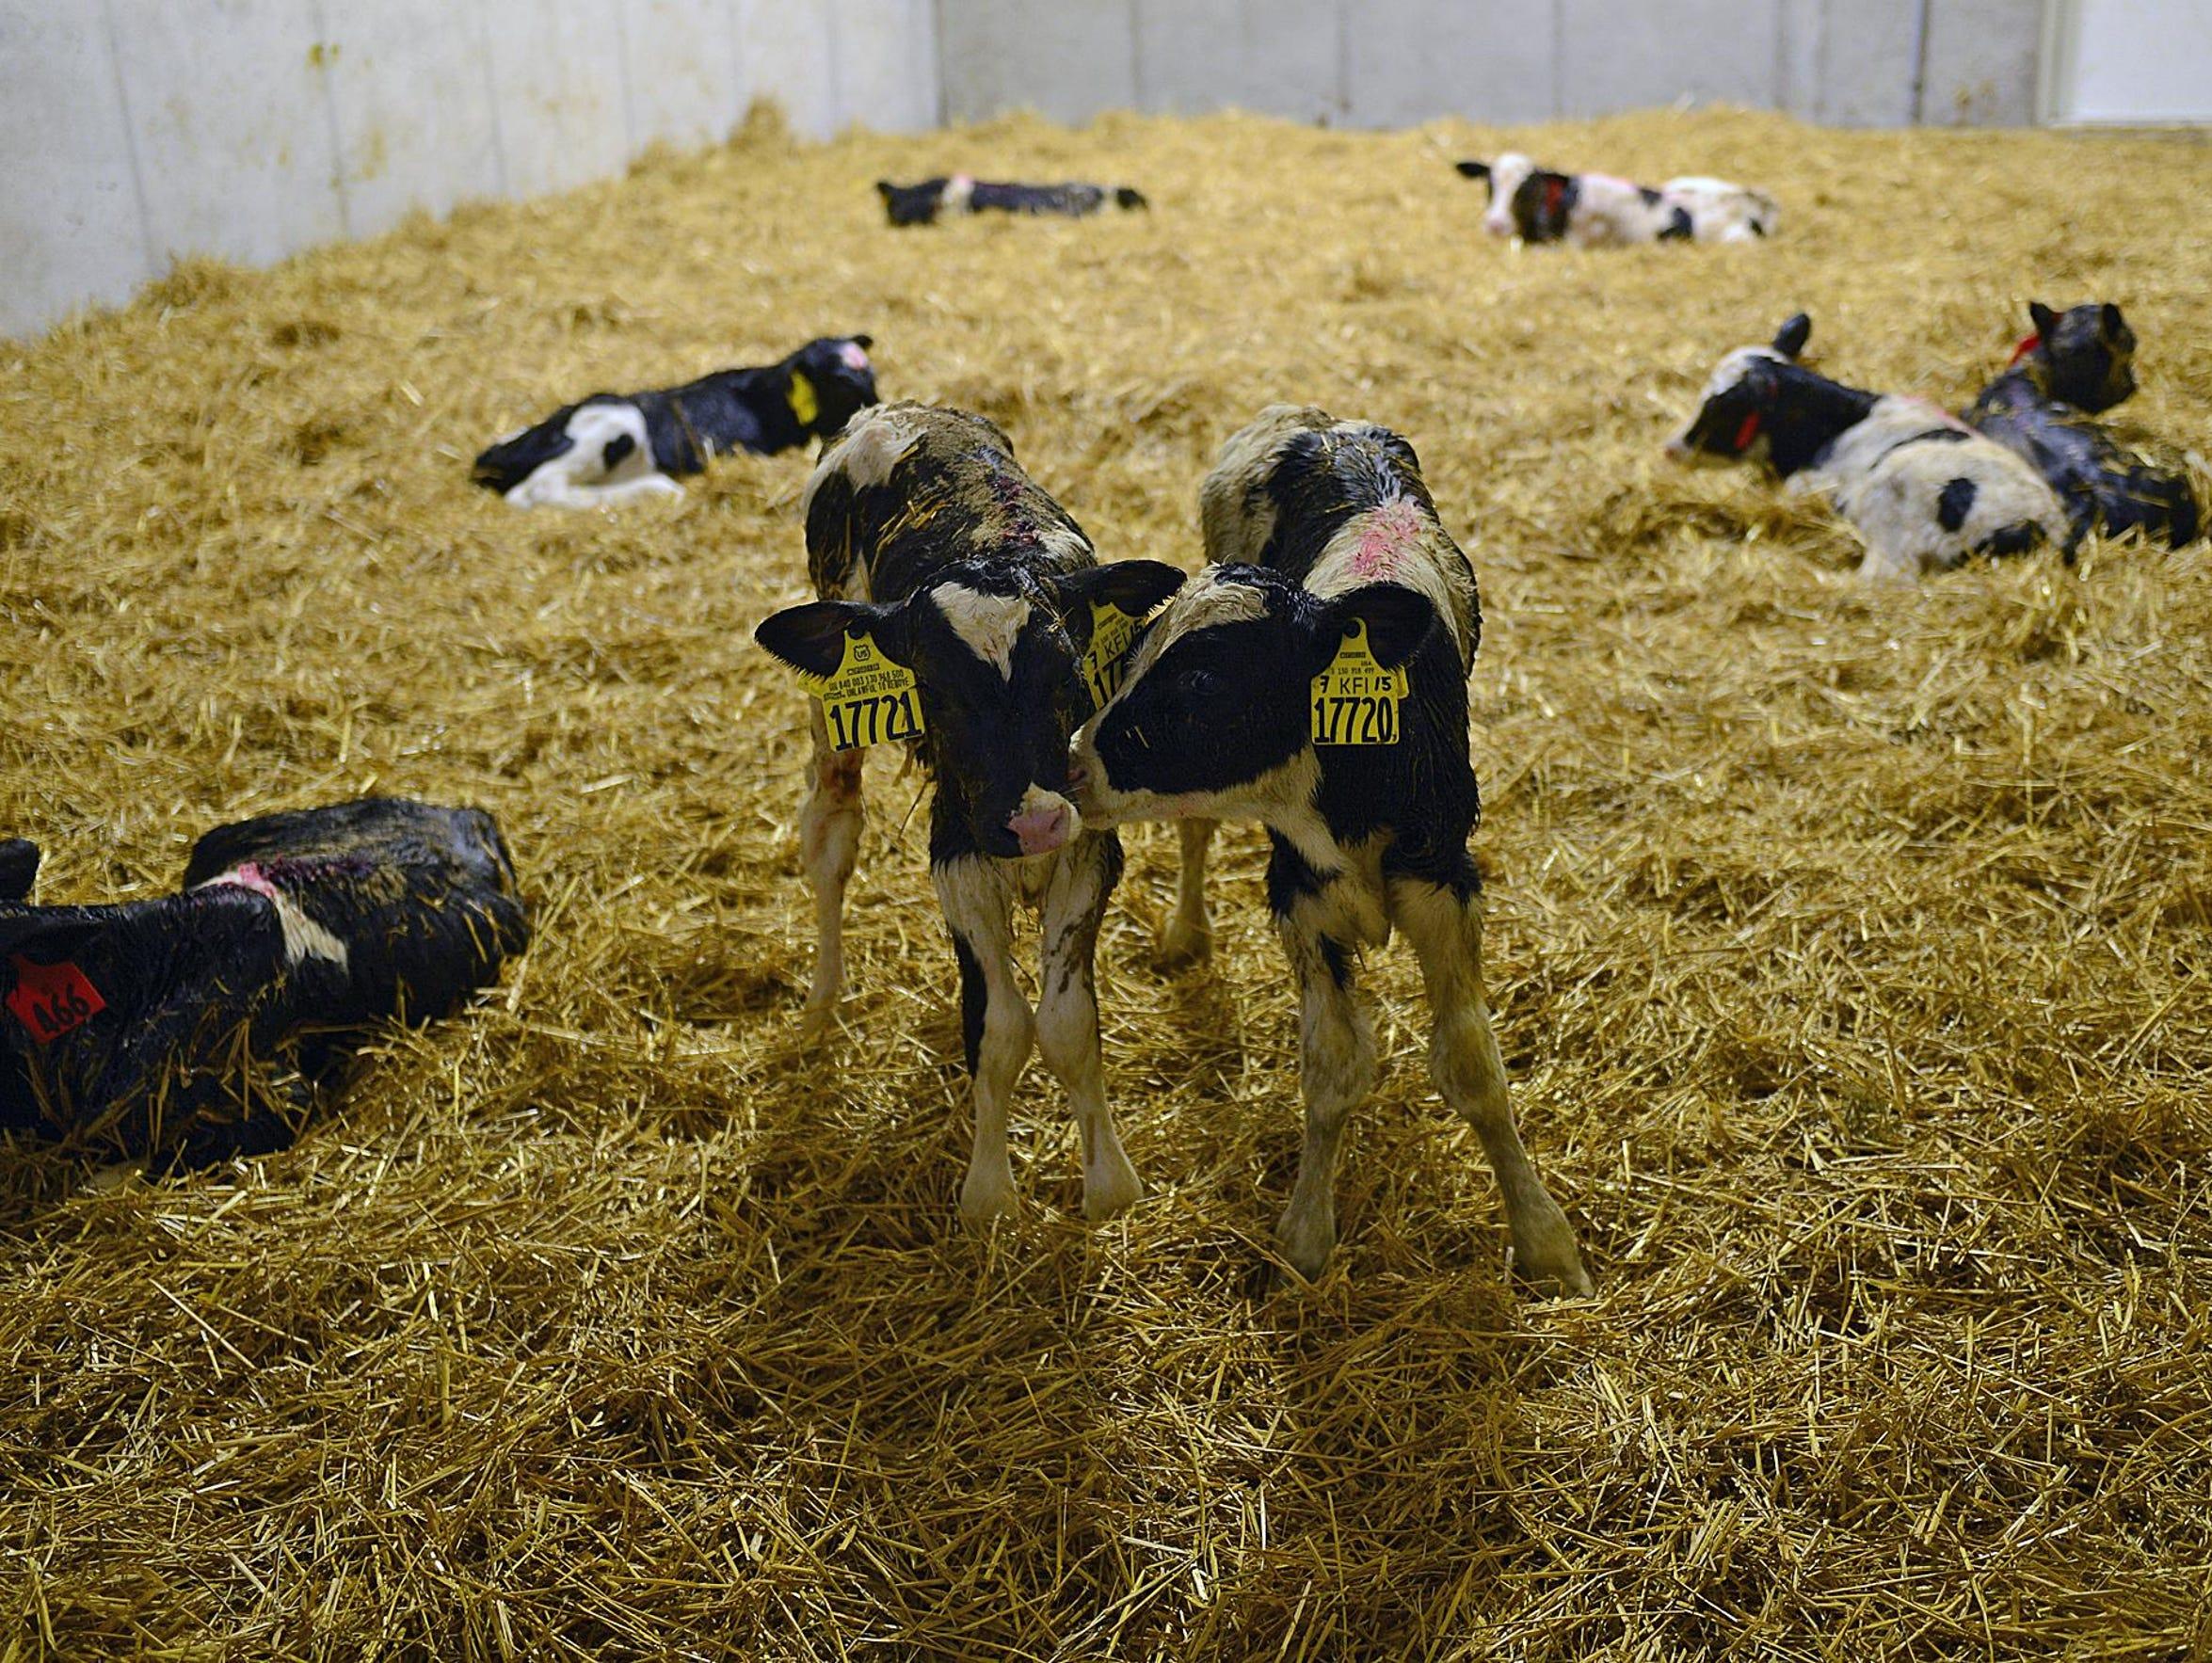 Twin calves at the Kinnard Farms Inc. expansion site